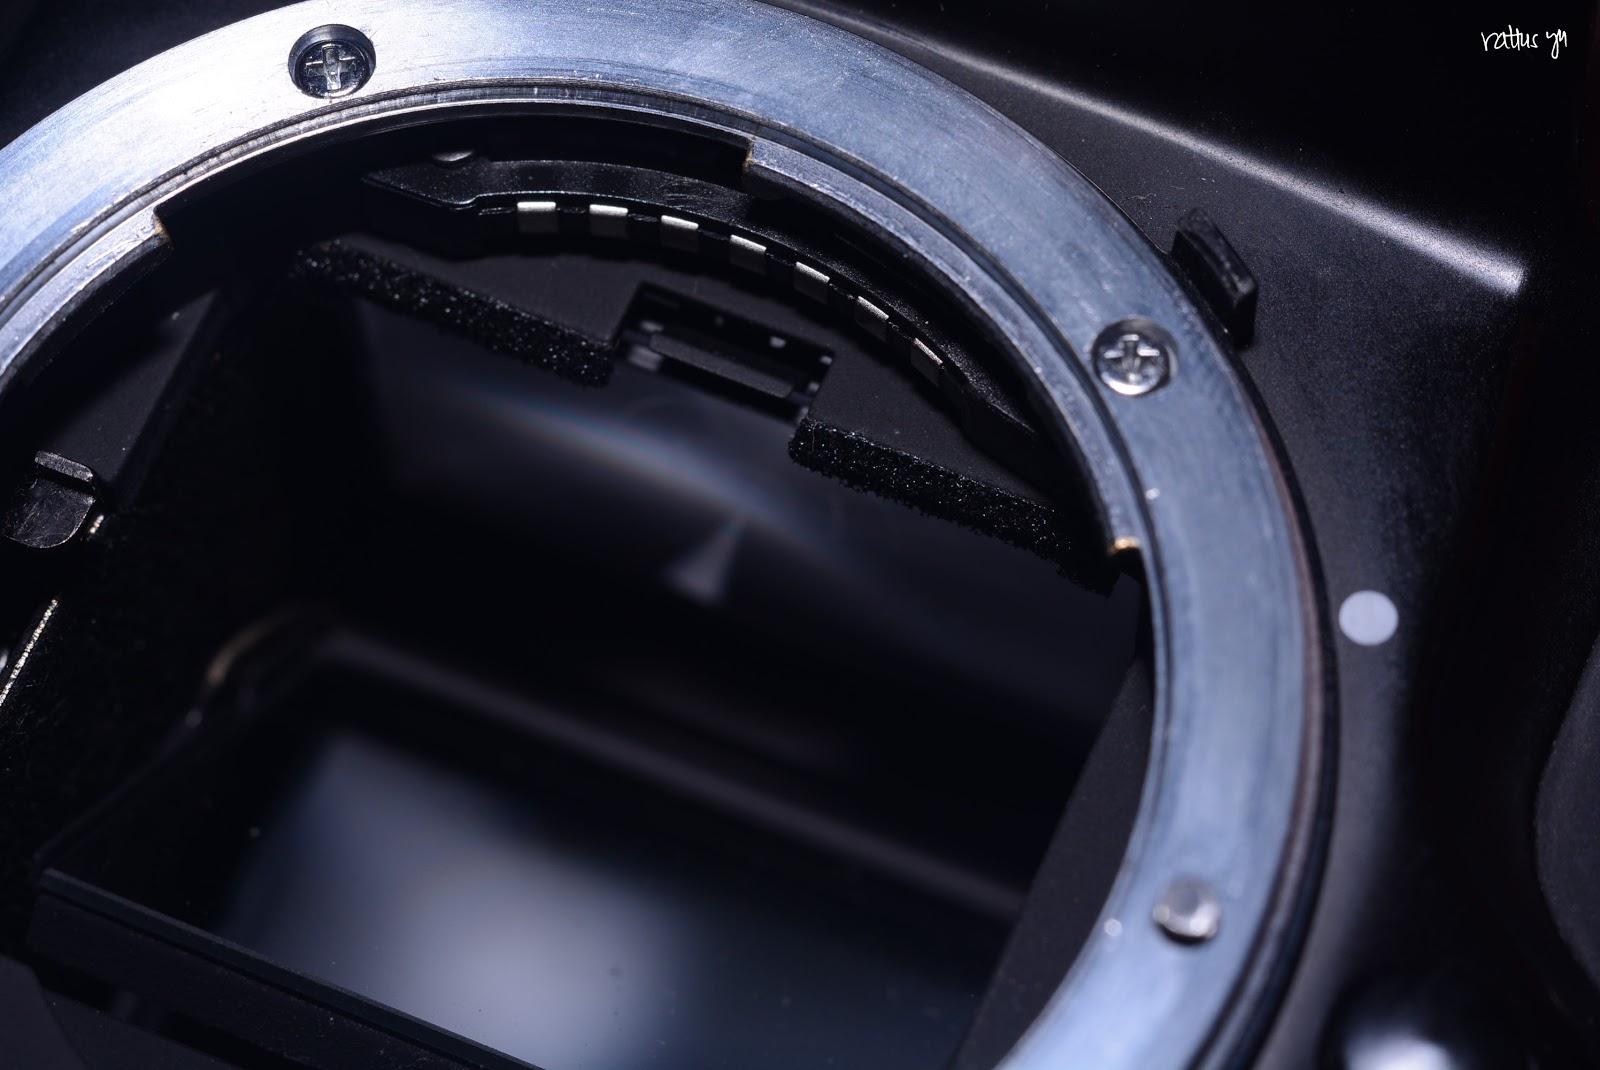 Micro-Nikkor 55mm f/3.5 (K Version)